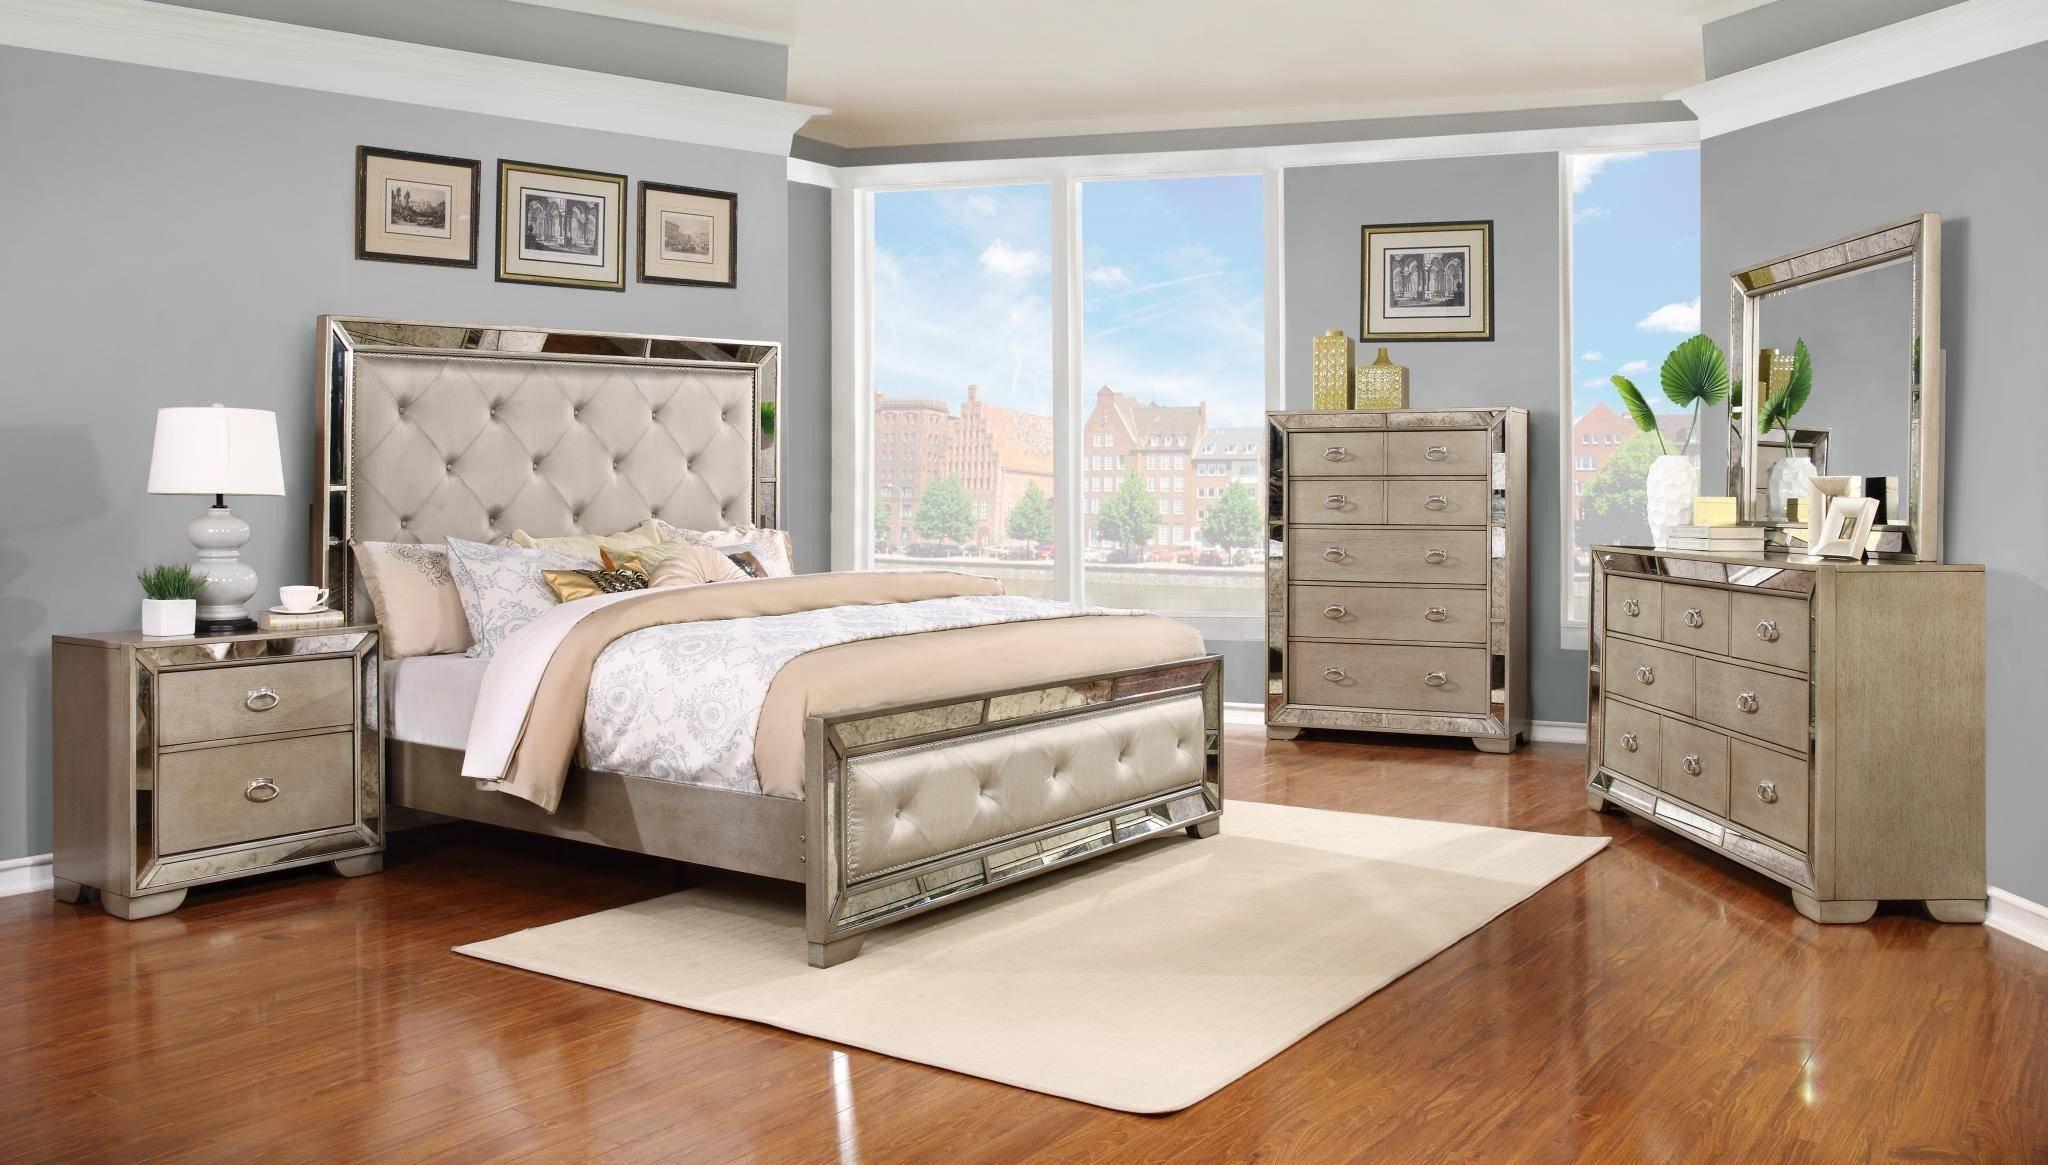 Leather Headboard Bedroom Set Elegant soflex Lilyanna Diamond Tufted Headboard Queen Bedroom Set